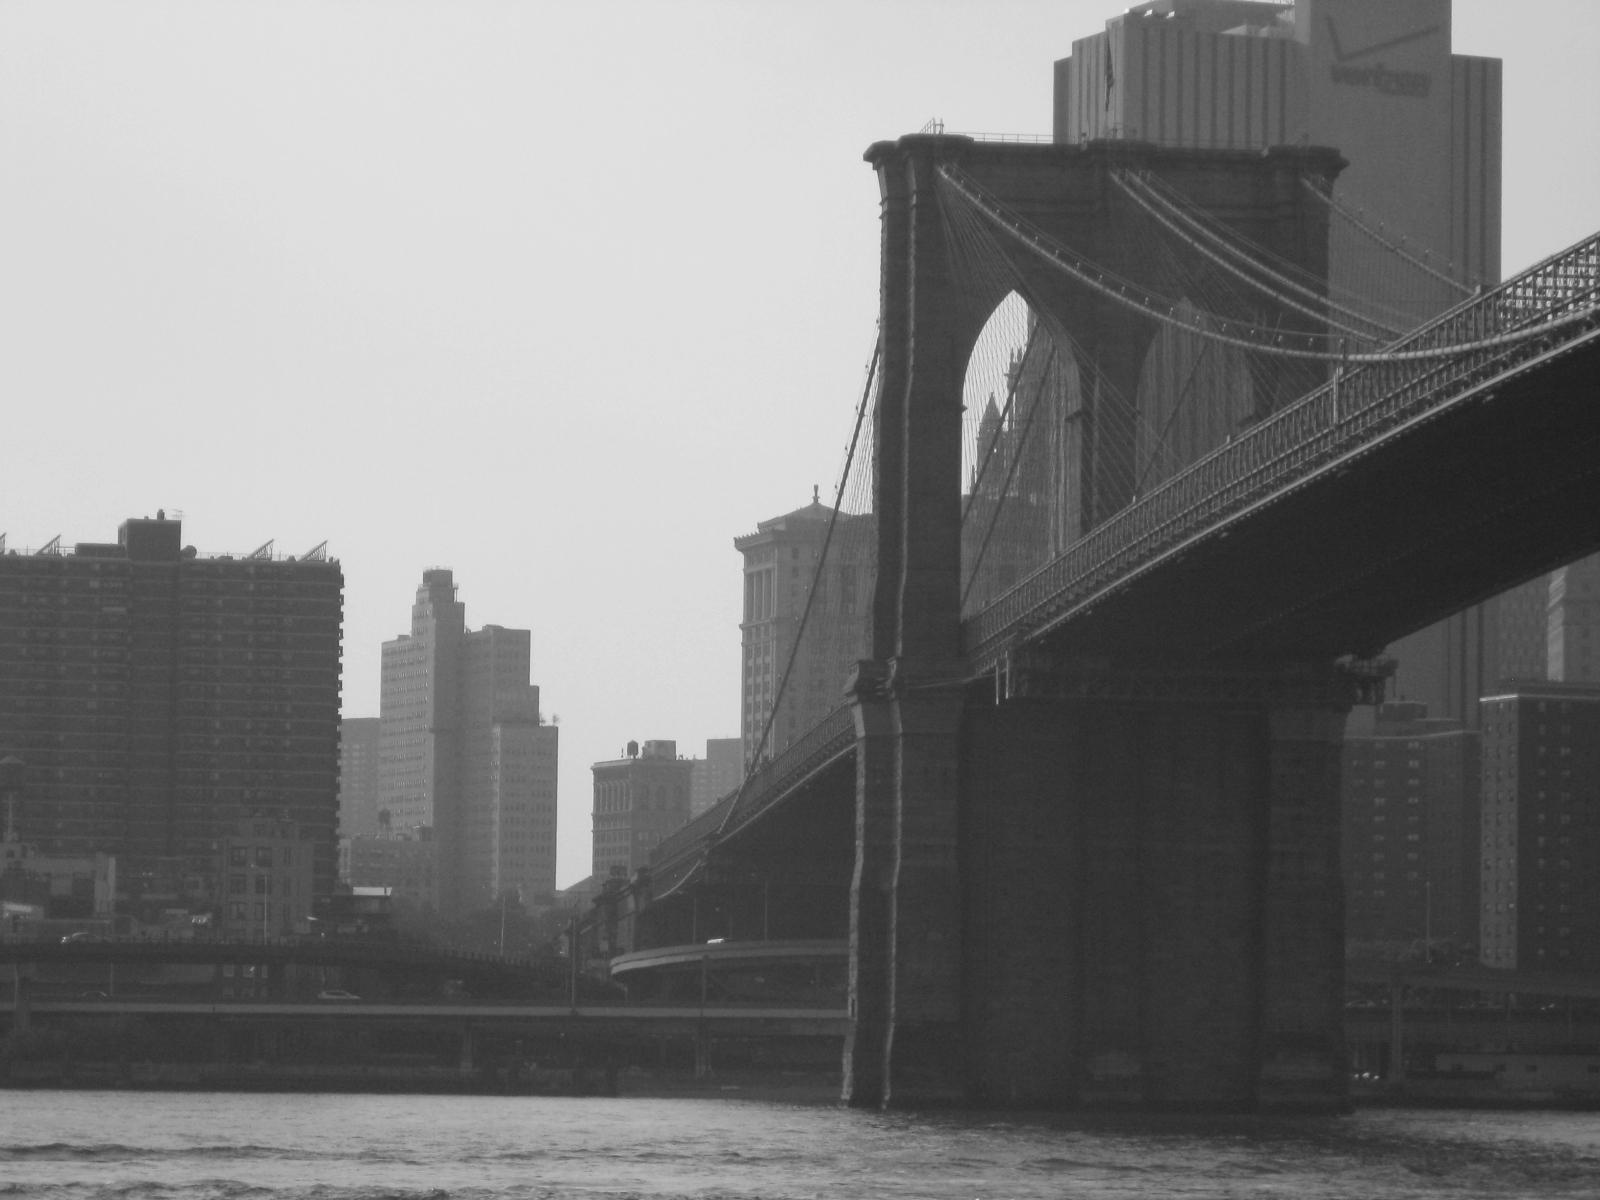 http://4.bp.blogspot.com/_OvVrJ6j3yC8/TCt4EXiJMTI/AAAAAAAAAKY/gYjIa7U1eFA/s1600/New+York+City+06-10+218.jpg